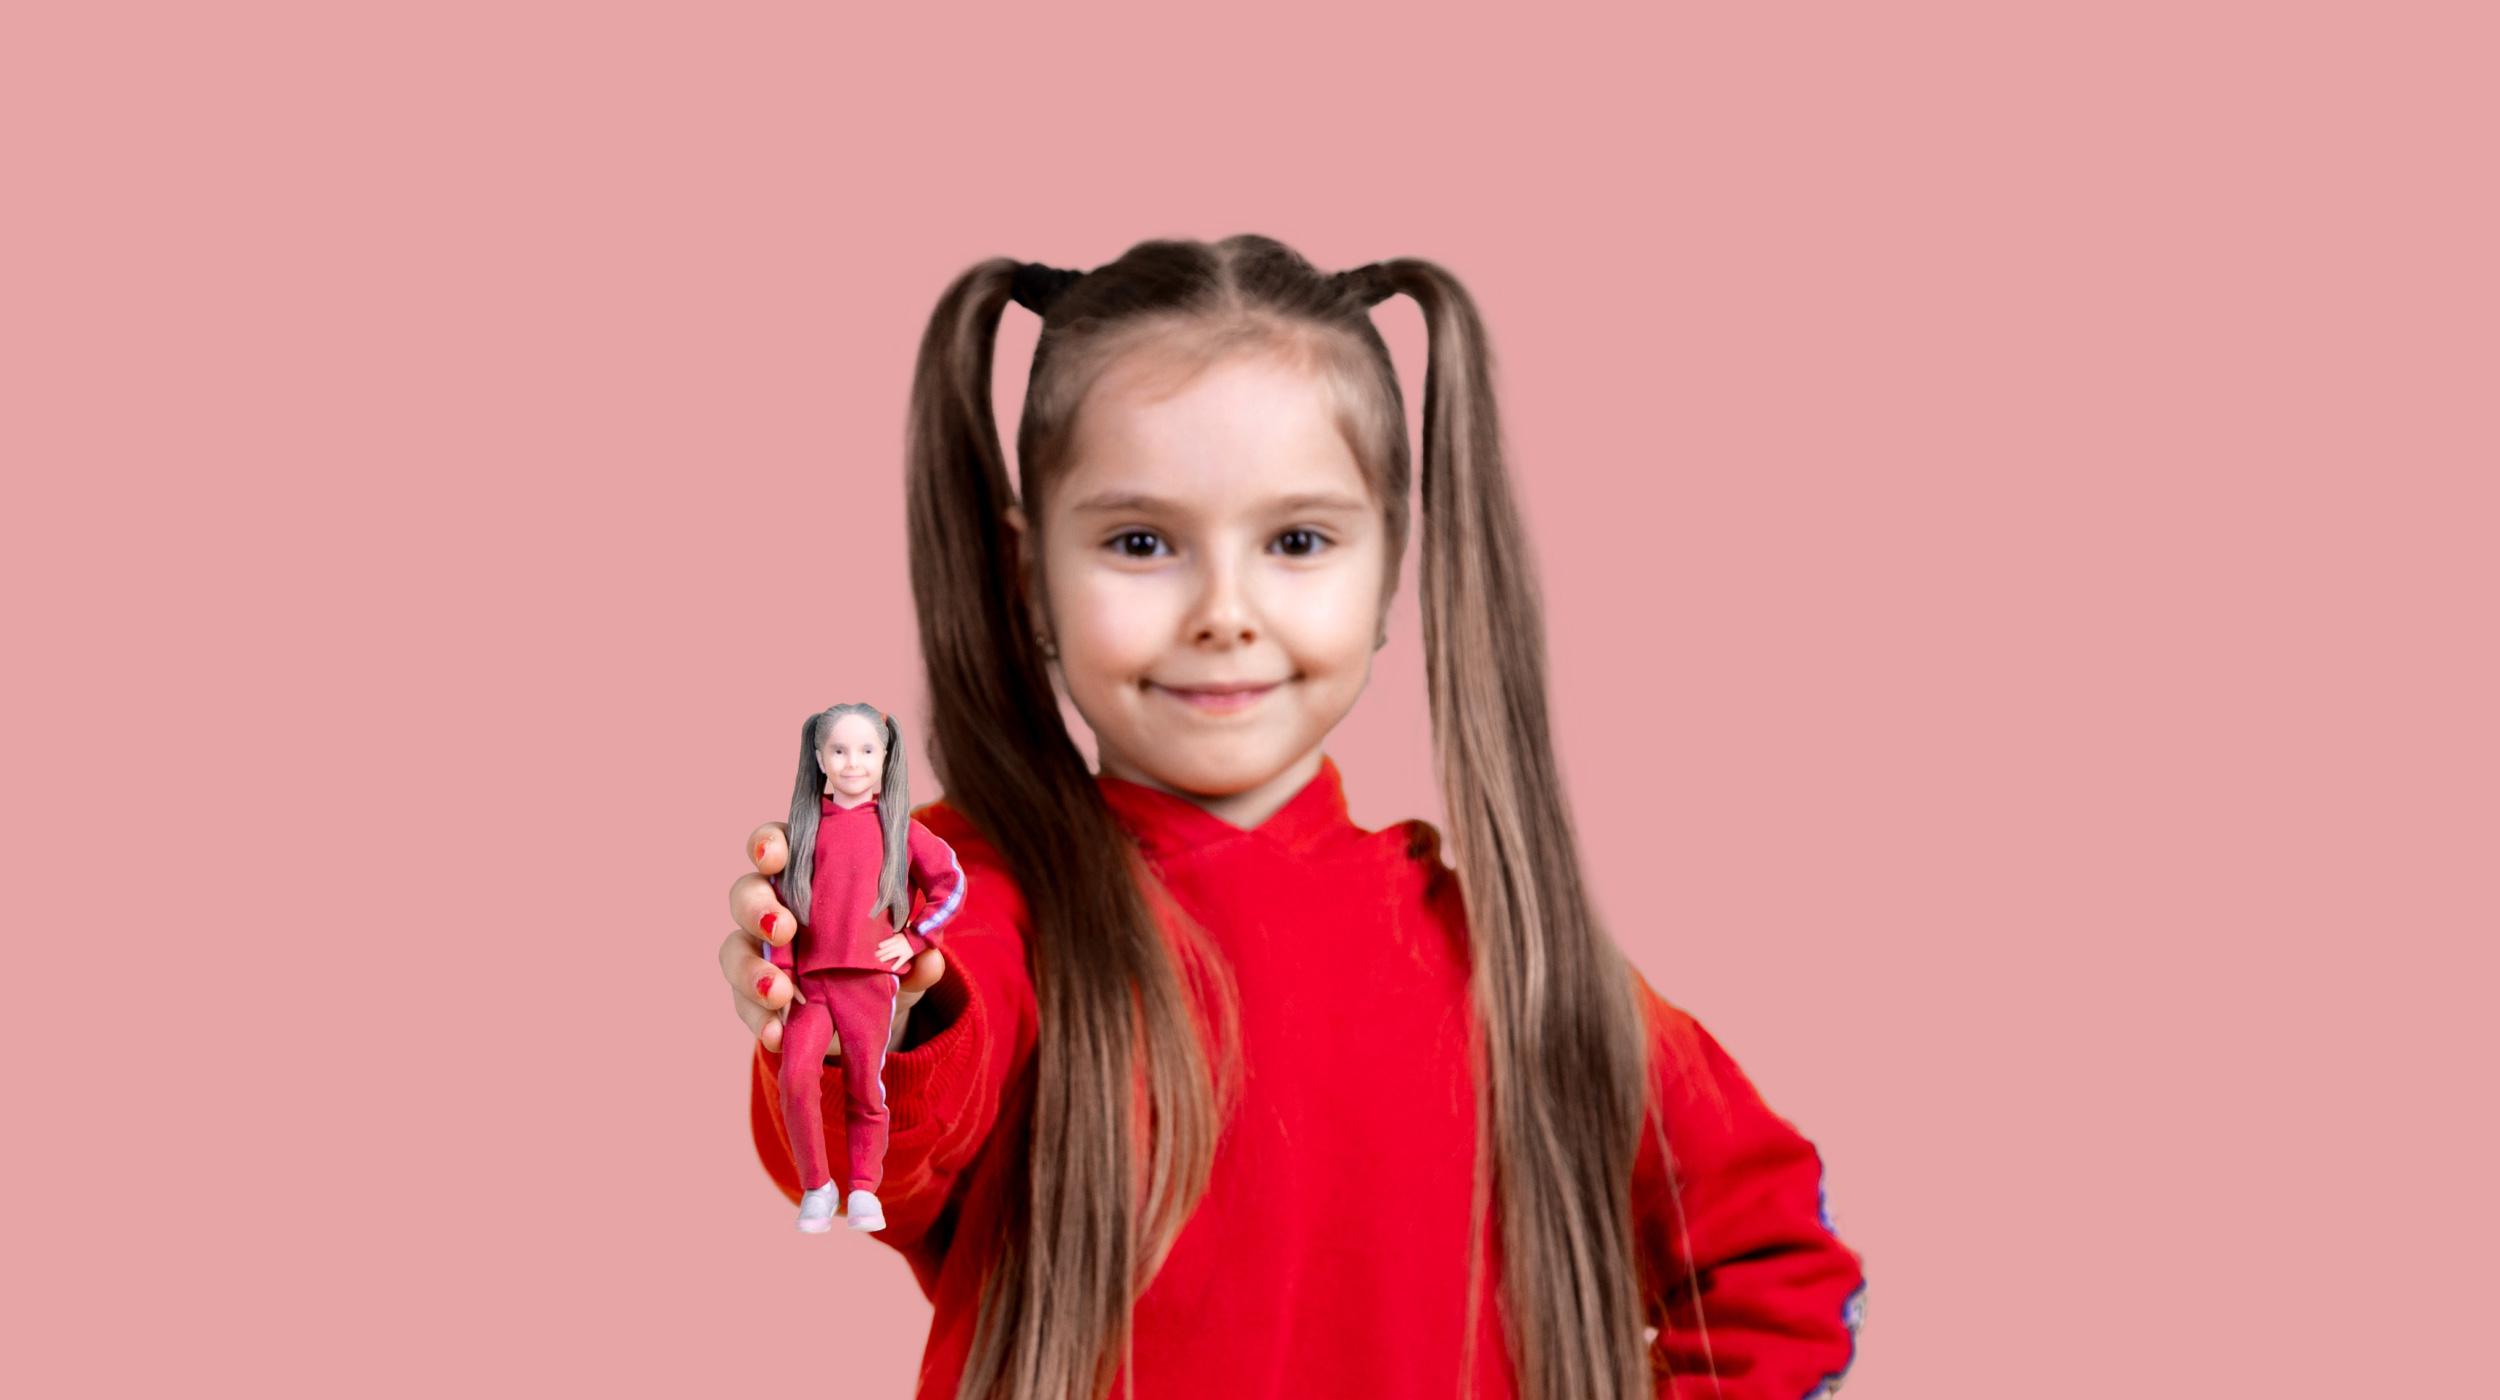 3D gedruckte Replik des Mädchens